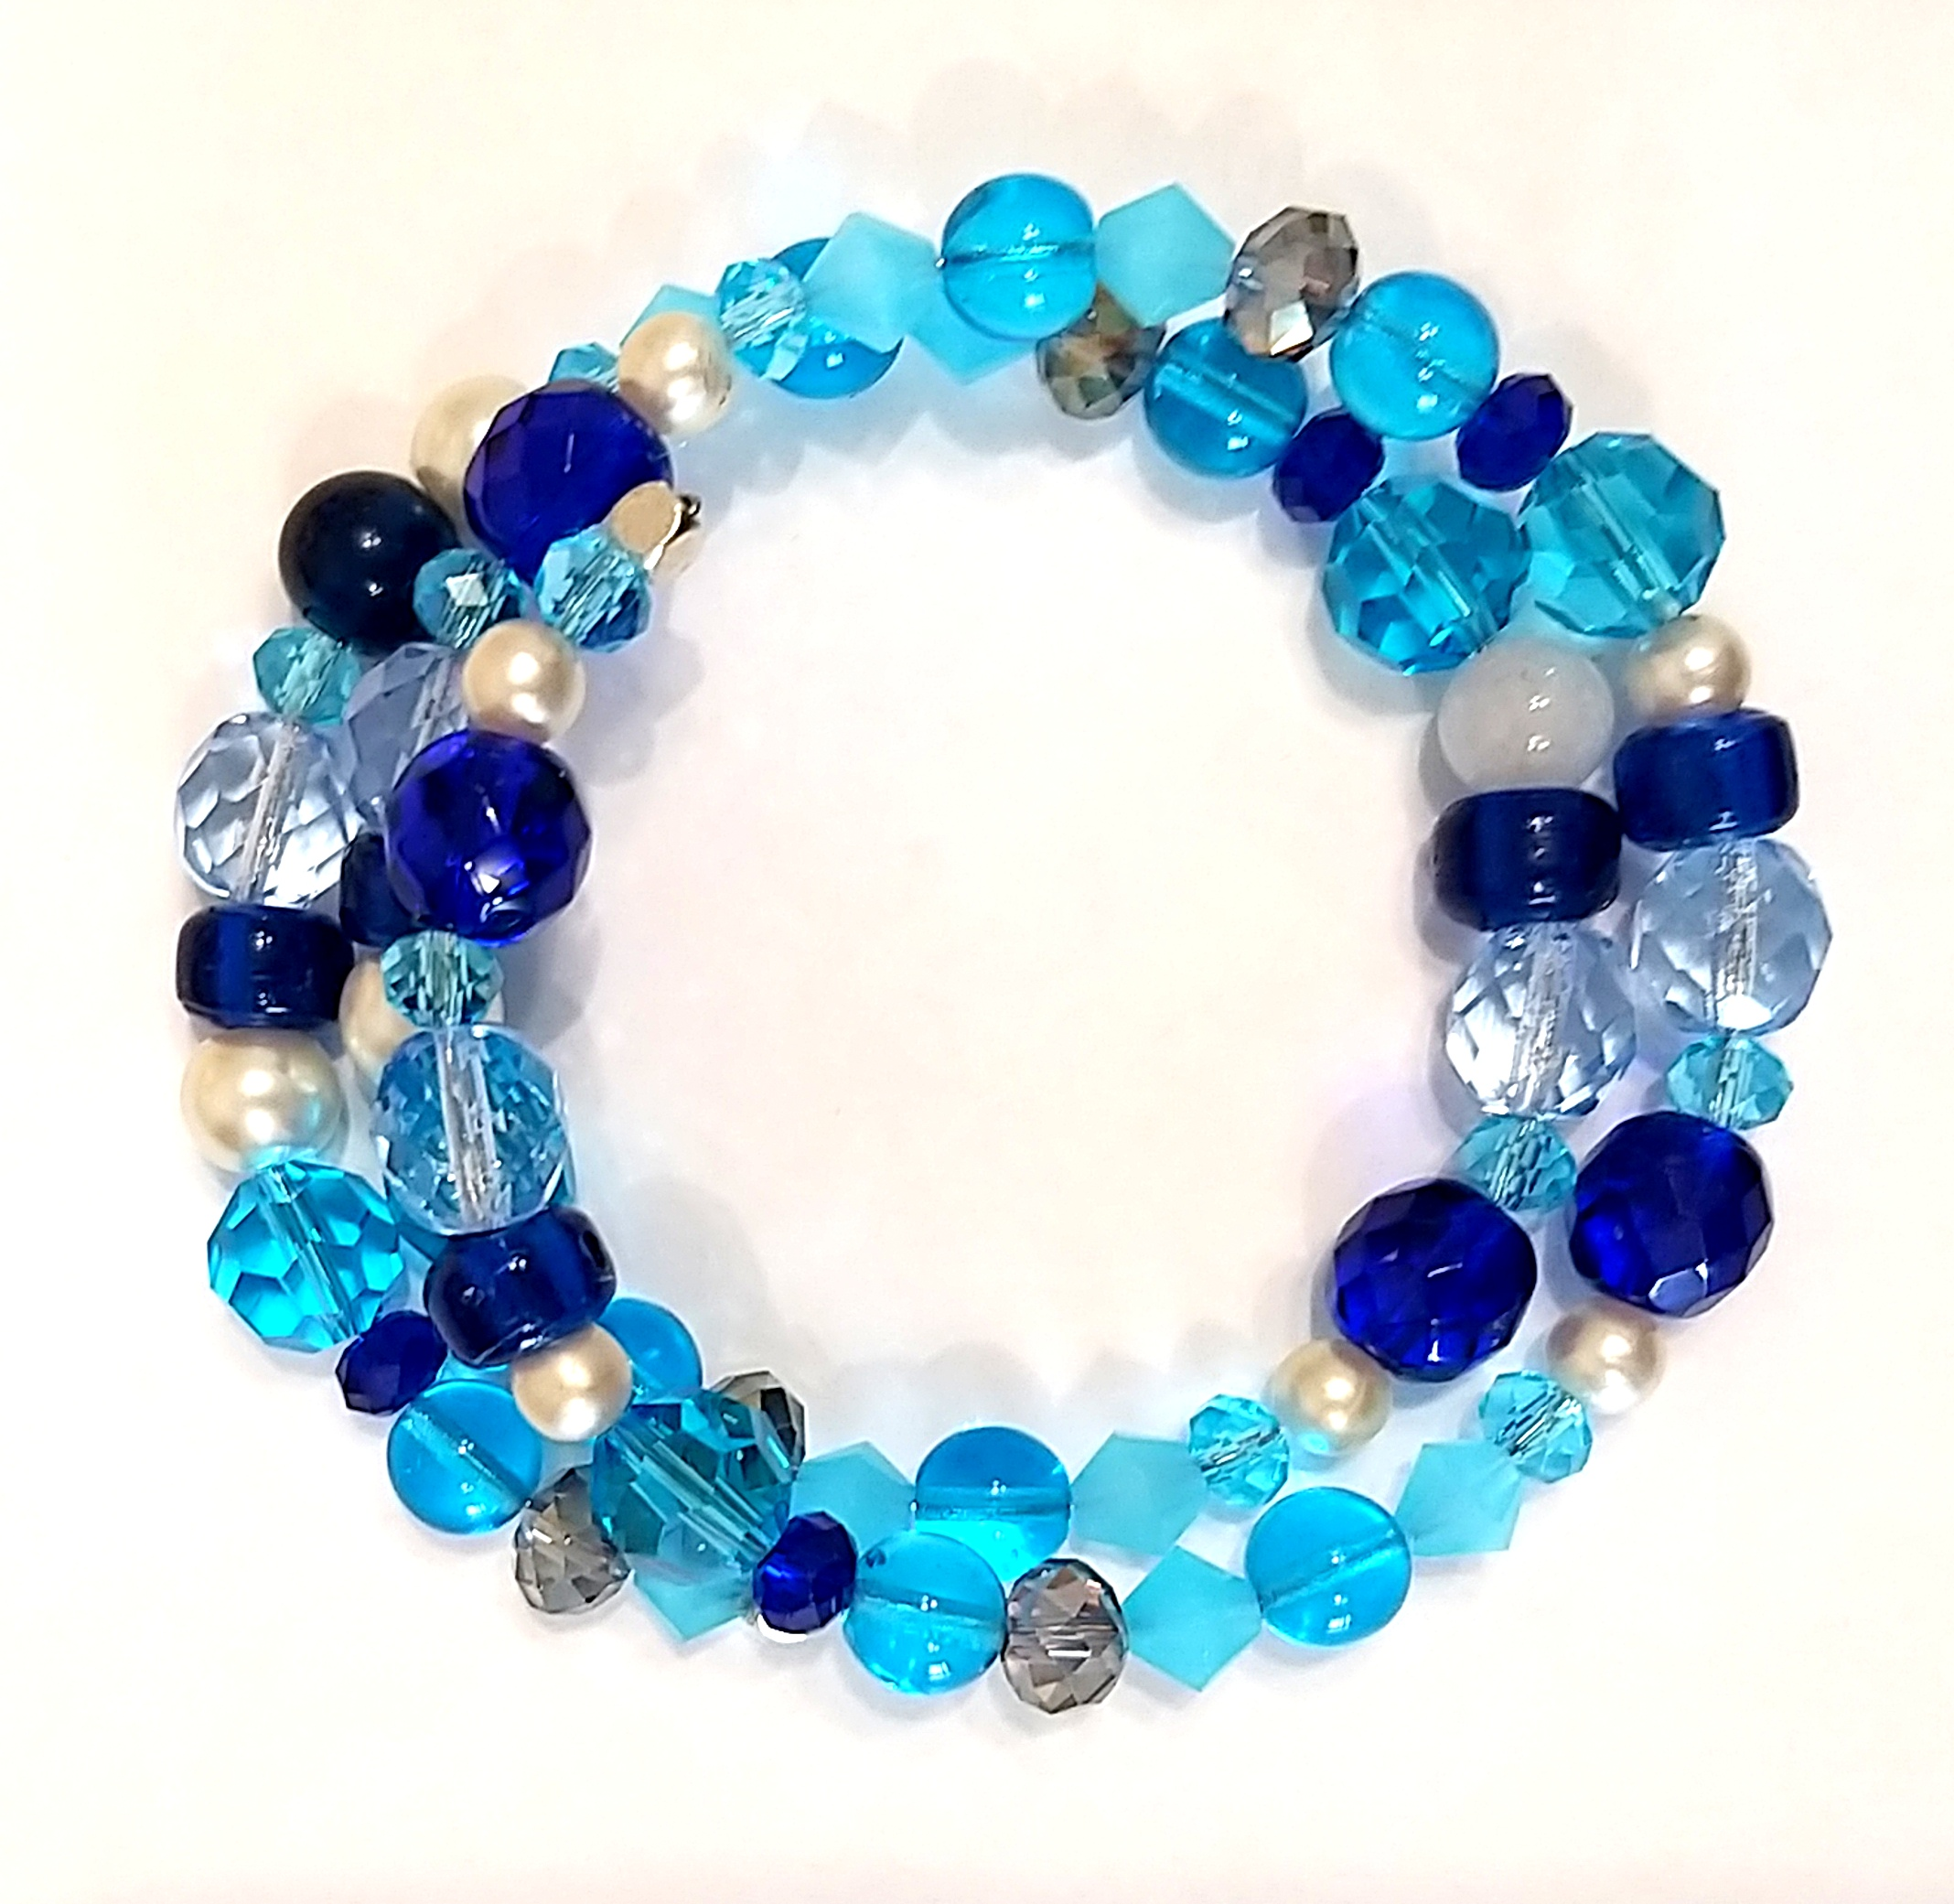 #FP-BN 190824  Bracelet or NECKLACE   suggested $25 USD